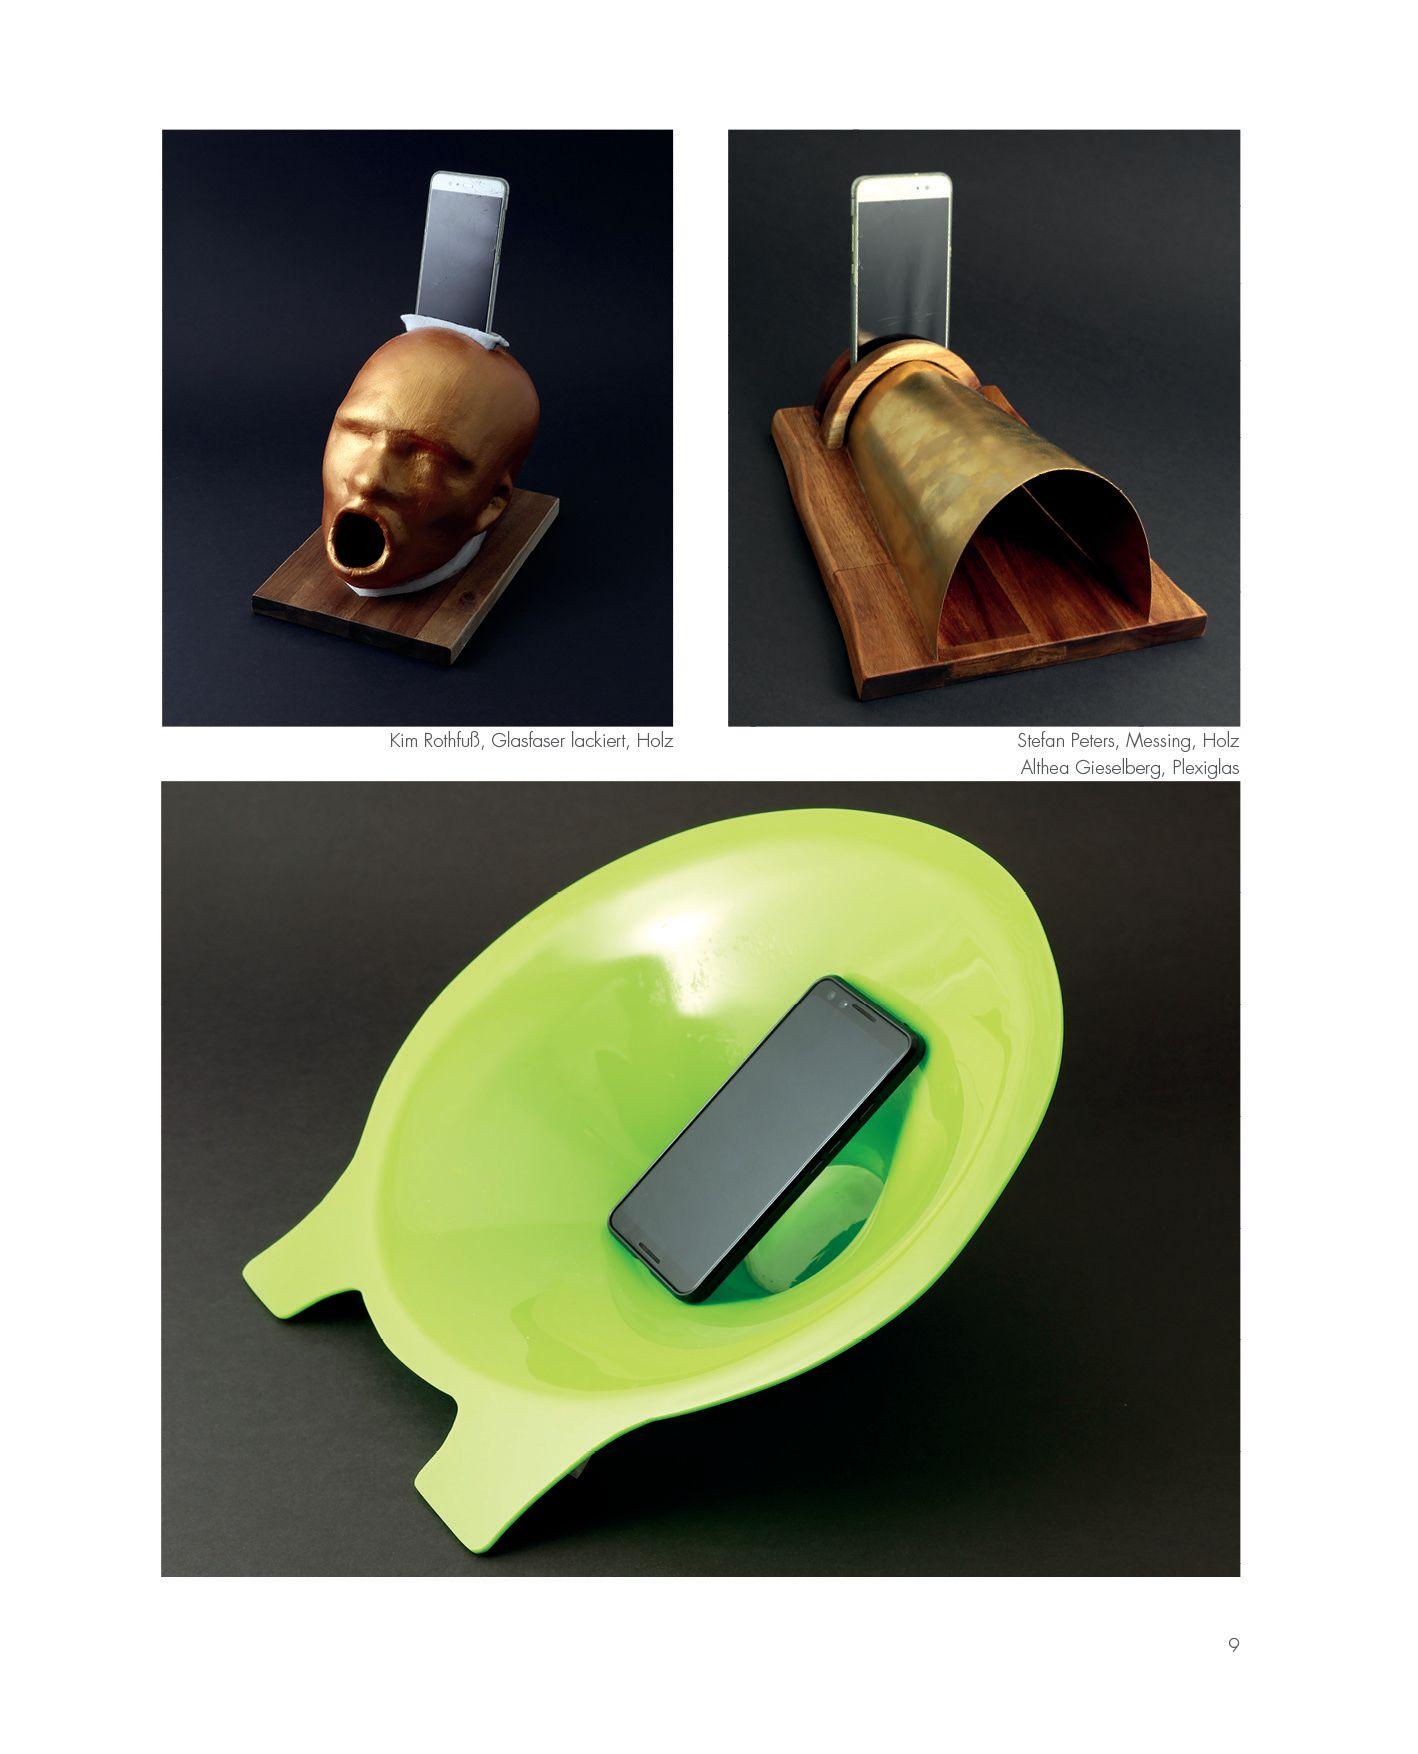 BK Produktdesign: Klangverstärker